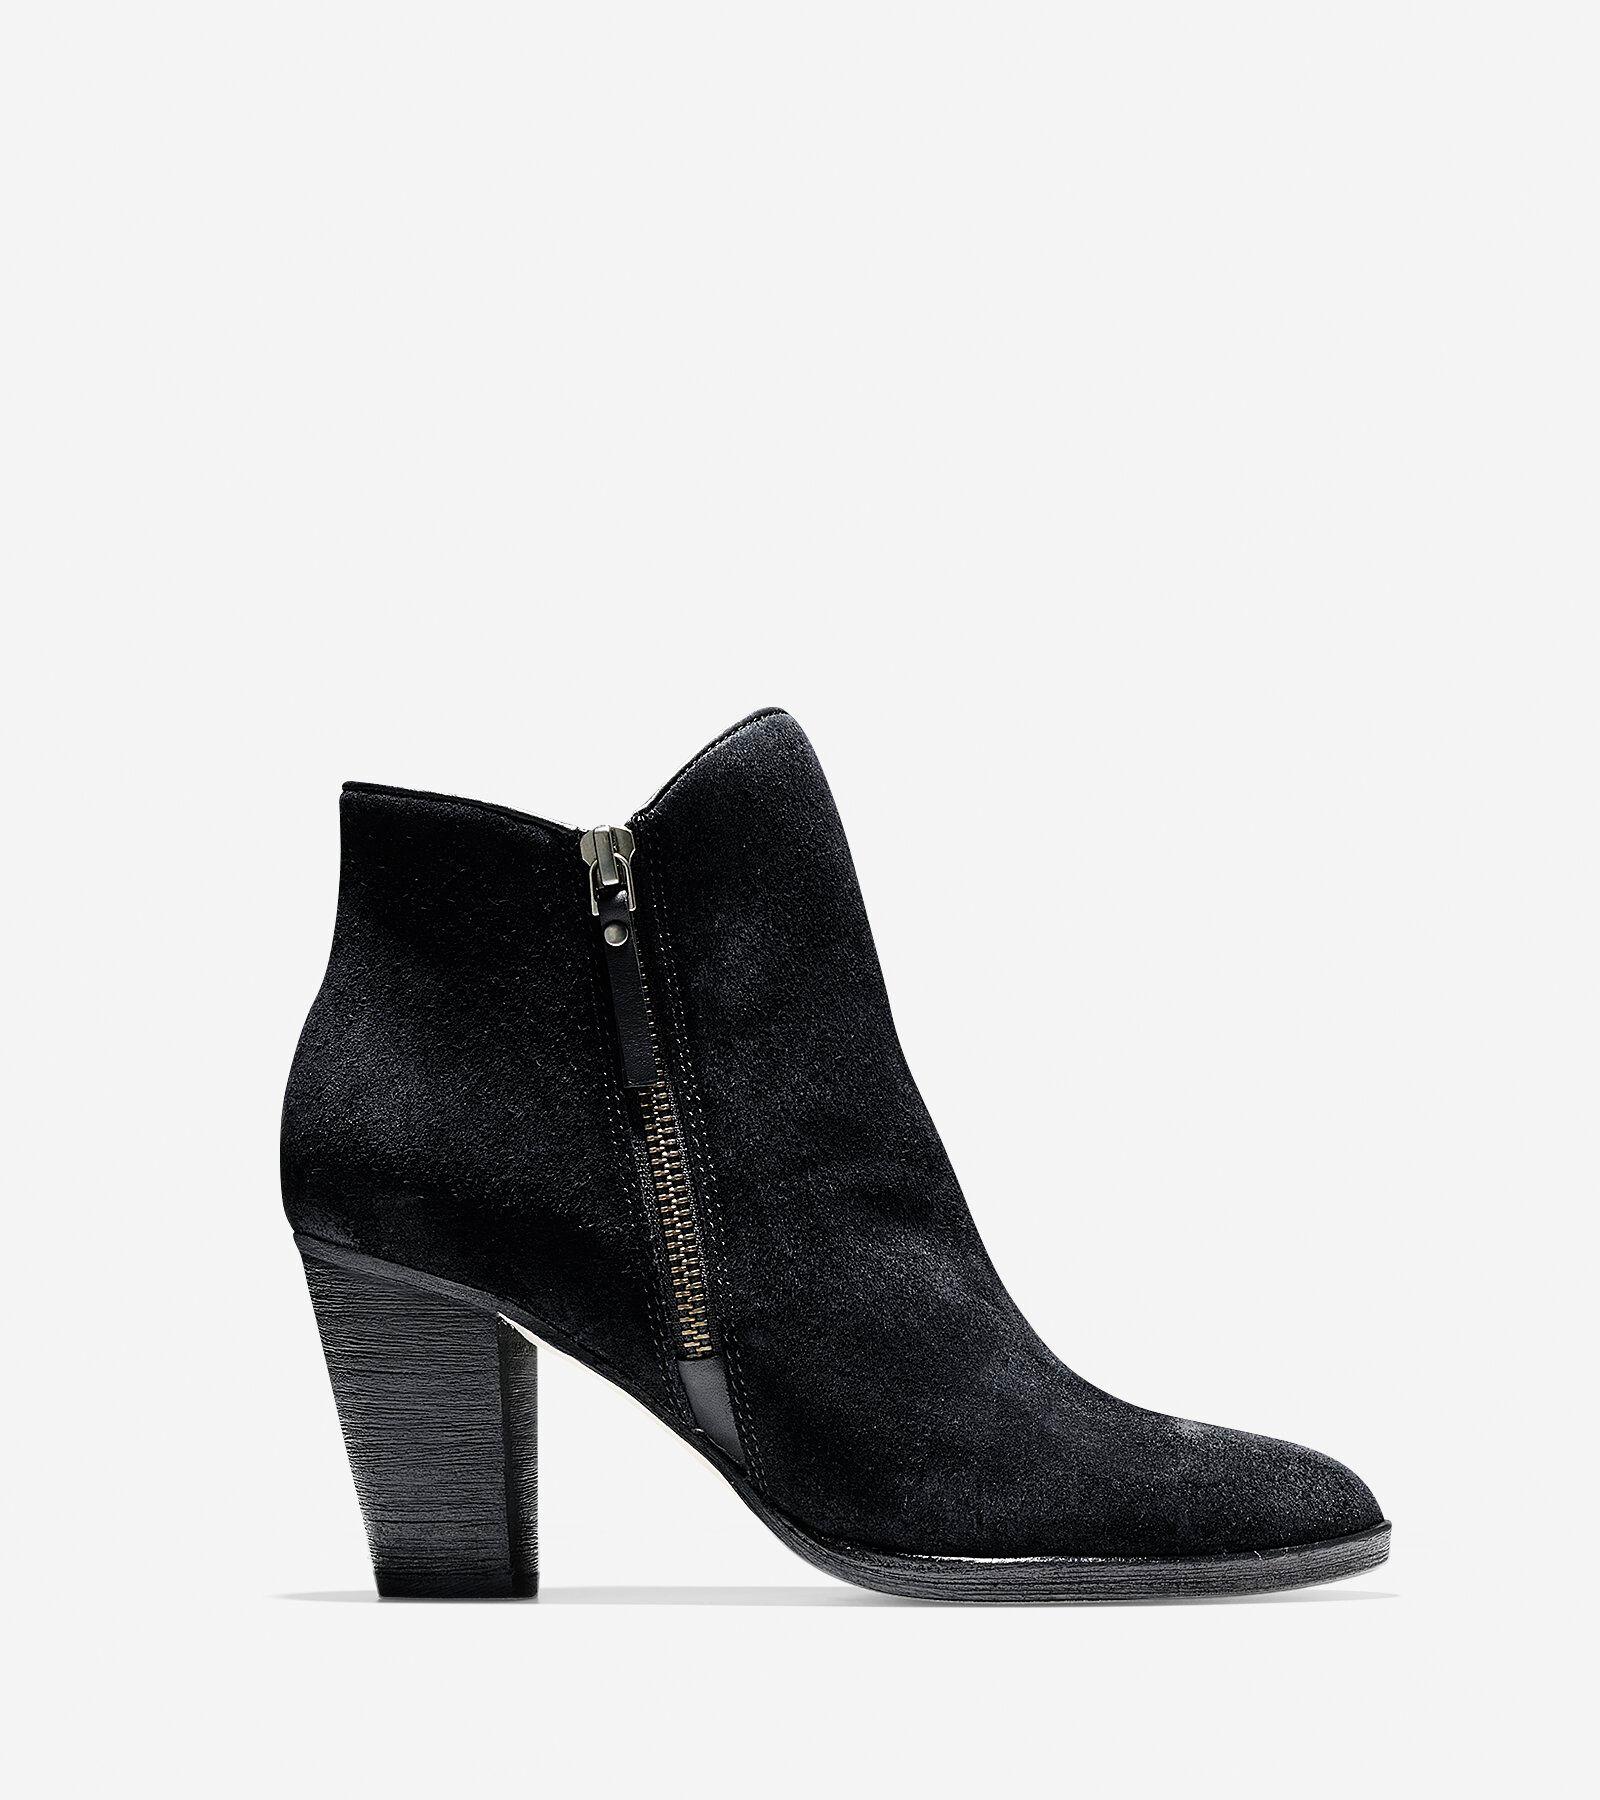 Shoe Boots Womens IsXf2Mvz